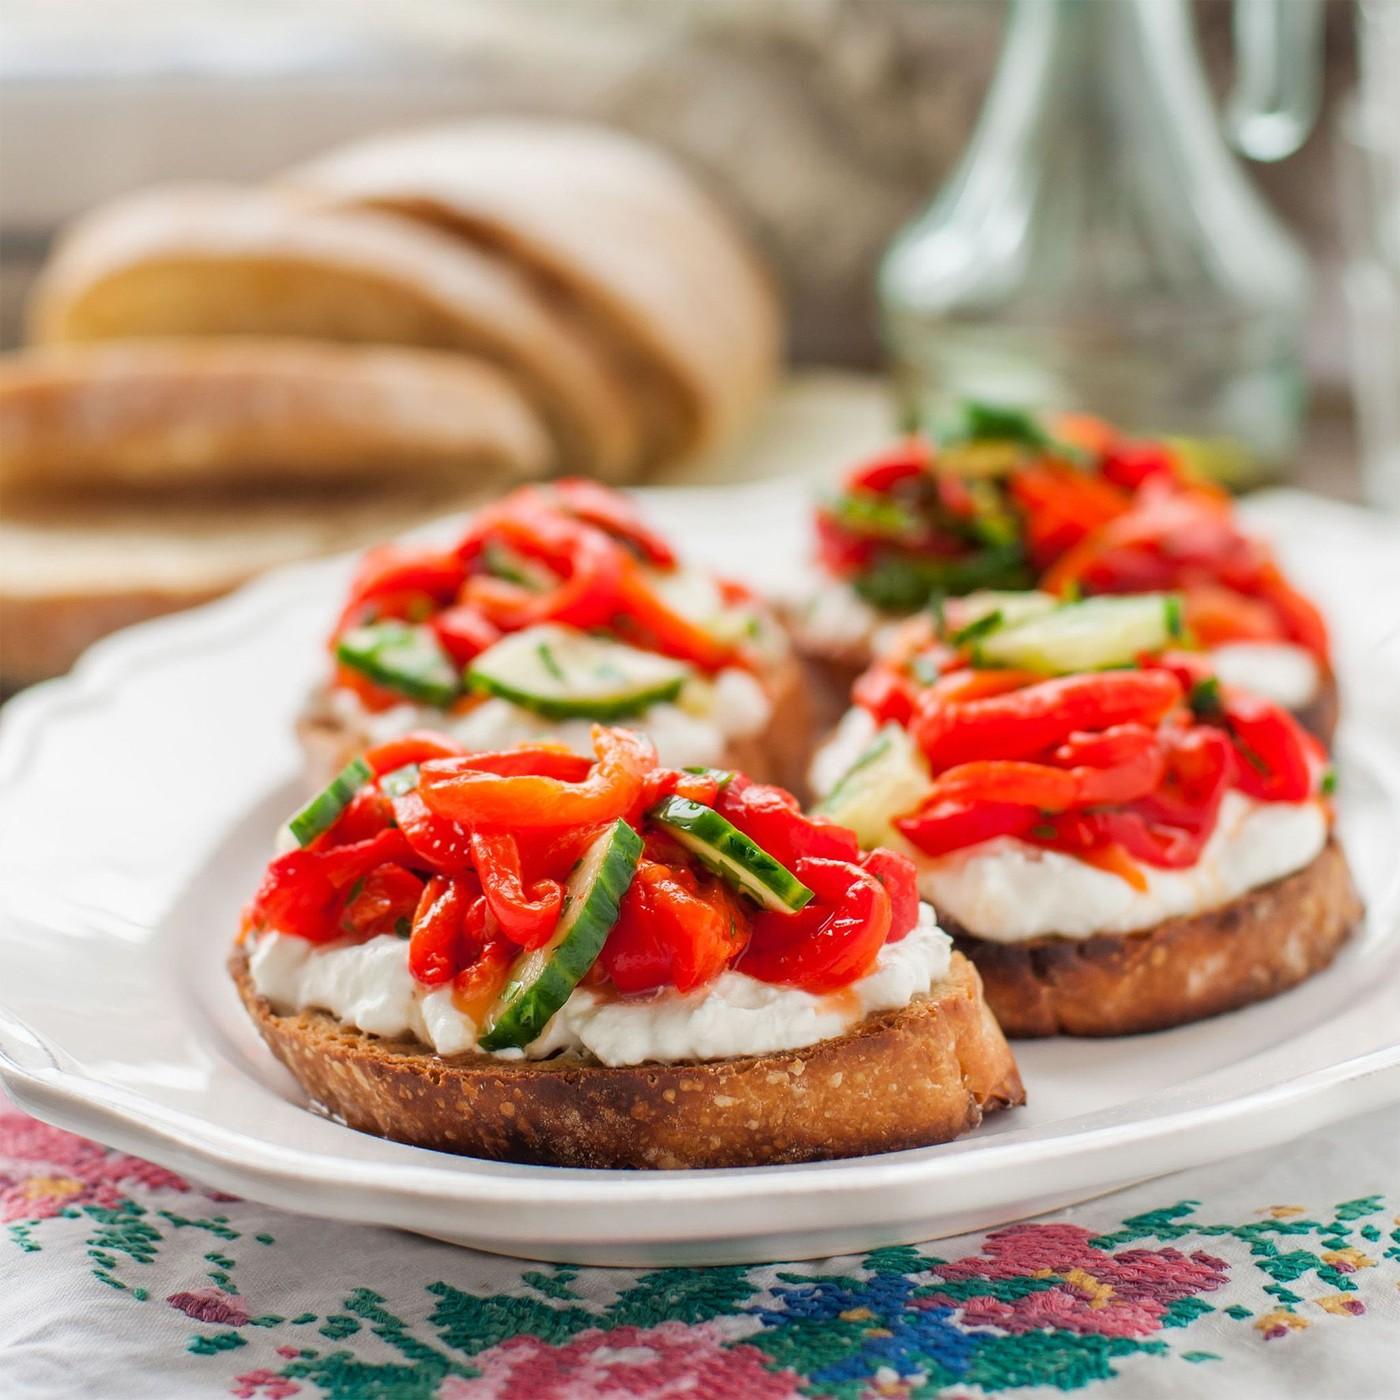 receta de Tronchetto (Gorgonzola E Mascarpone)